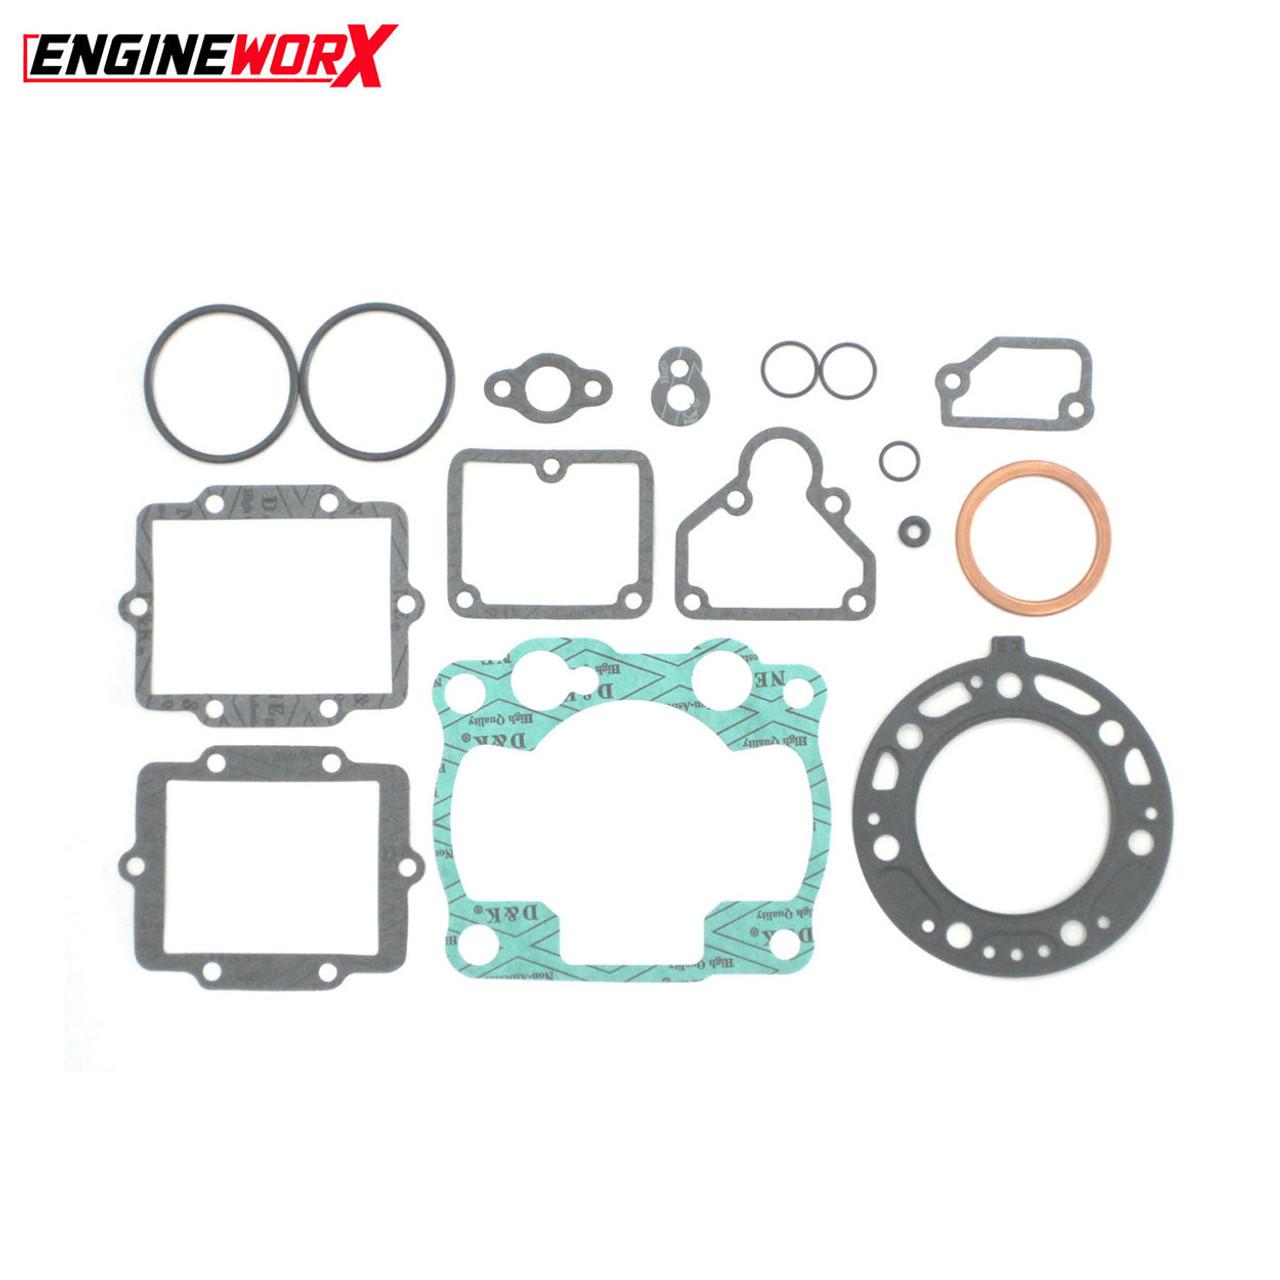 New Kawasaki KXF 450 09-15 Engineworx Full Engine Gasket Kit Complete Set MX